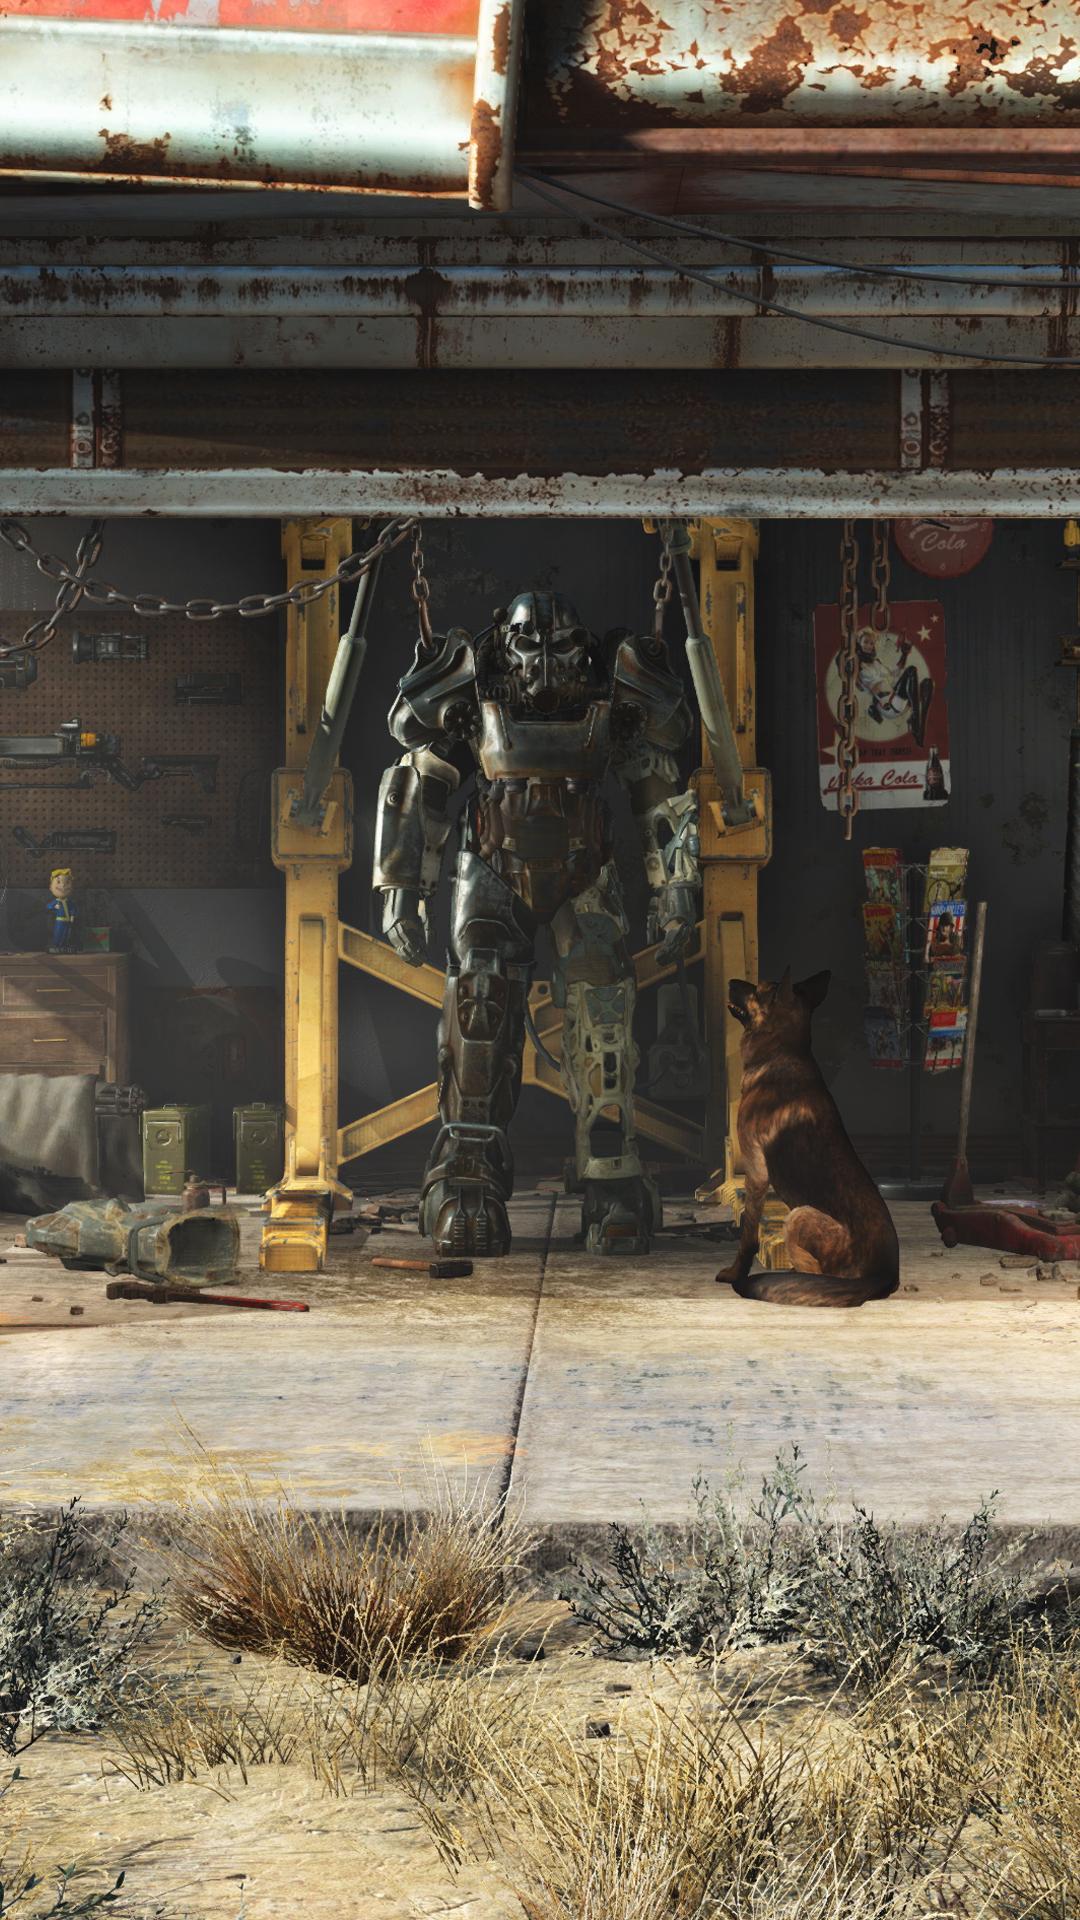 42+ Fallout 4 Phone Wallpapers on WallpaperSafari